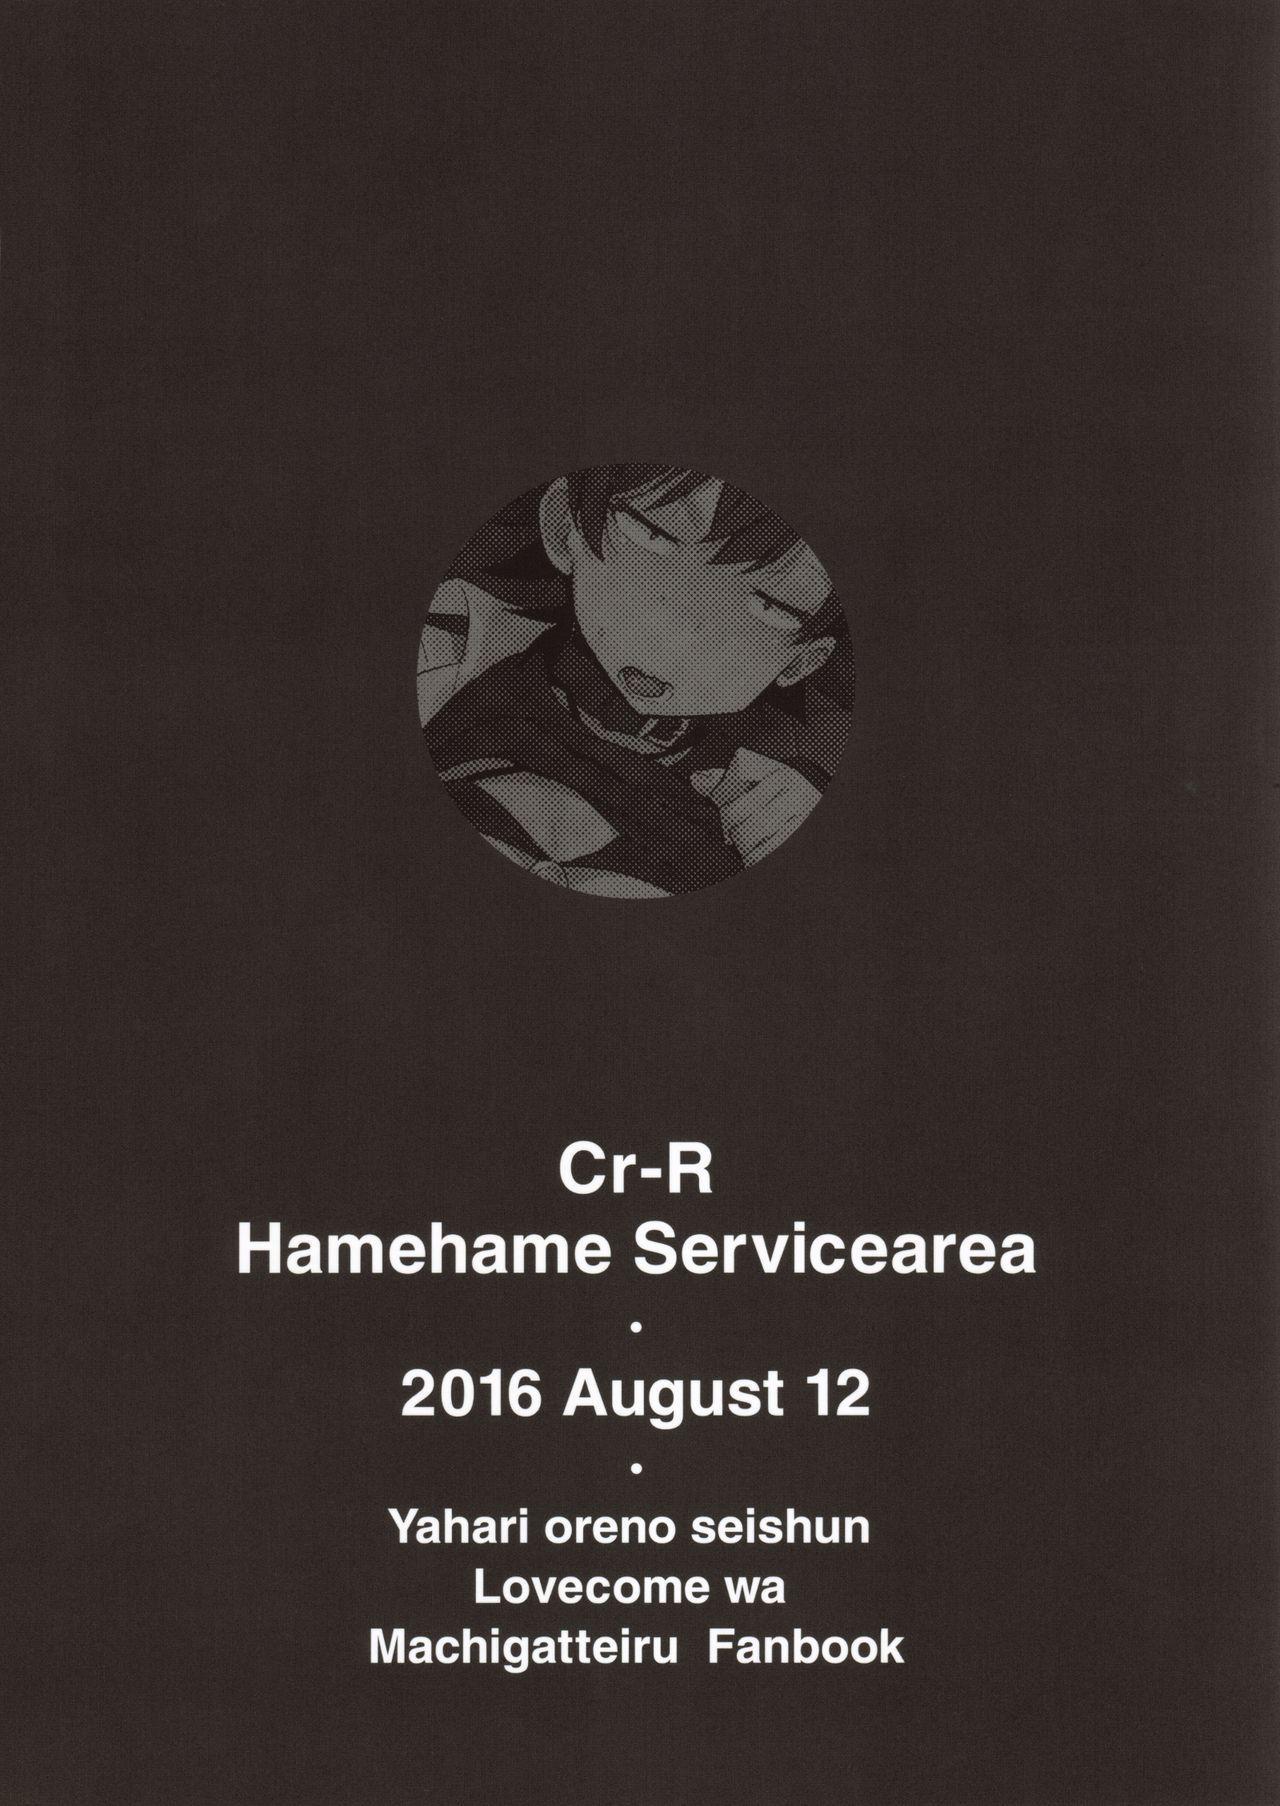 (C90) [Hamehame Service Area (Cr-R)] Hikigaya Hachiman no Houshi Katsudou Kiroku -Costume Play Hen- | Hikigaya Hachiman's Record of Volunteering - Cosplay Chapter - (Yahari Ore no Seishun Love Come wa Machigatteiru.) [English] 21